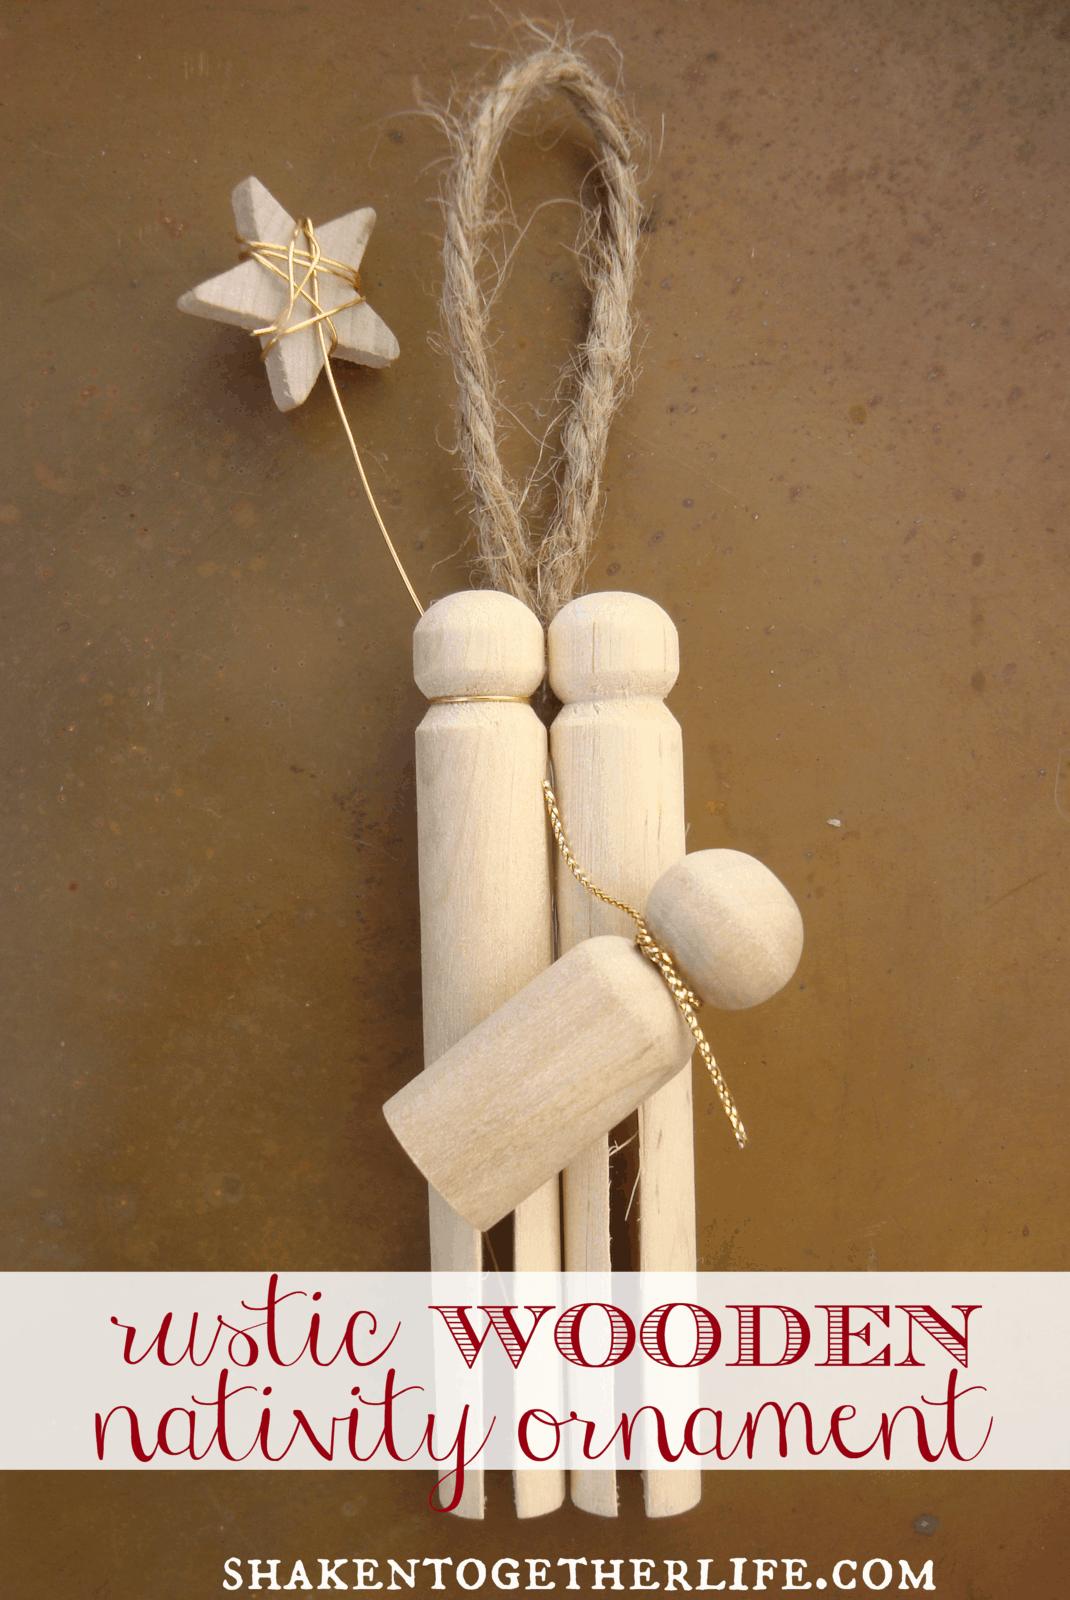 Make a rustic wooden nativity ornament!